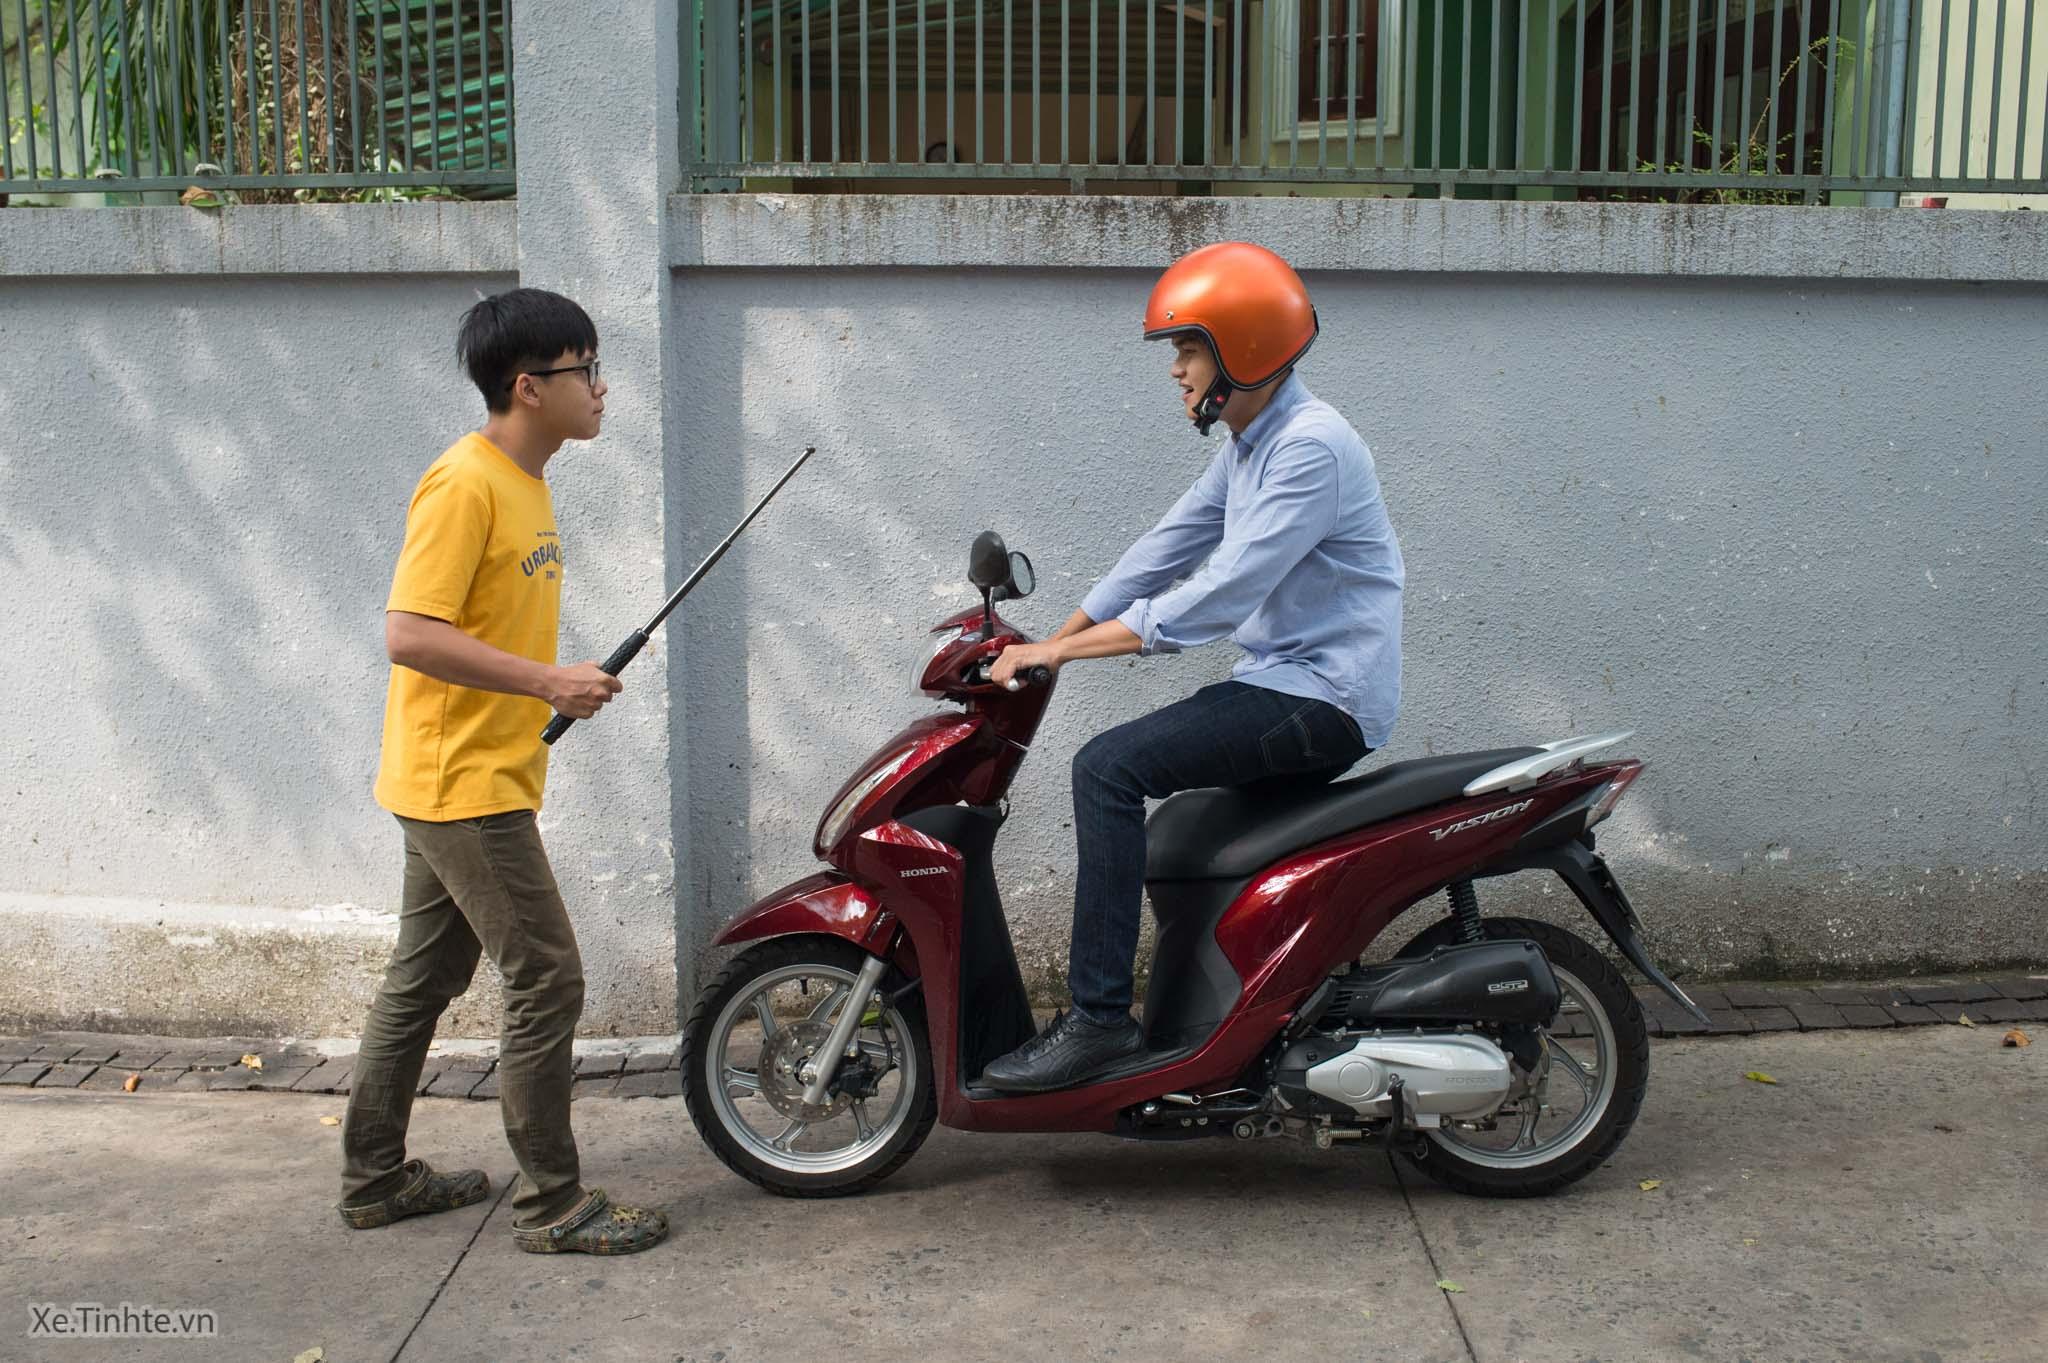 Khoa chong cuop xe may Fox_Xe.tinhte.vn-0101.jpg